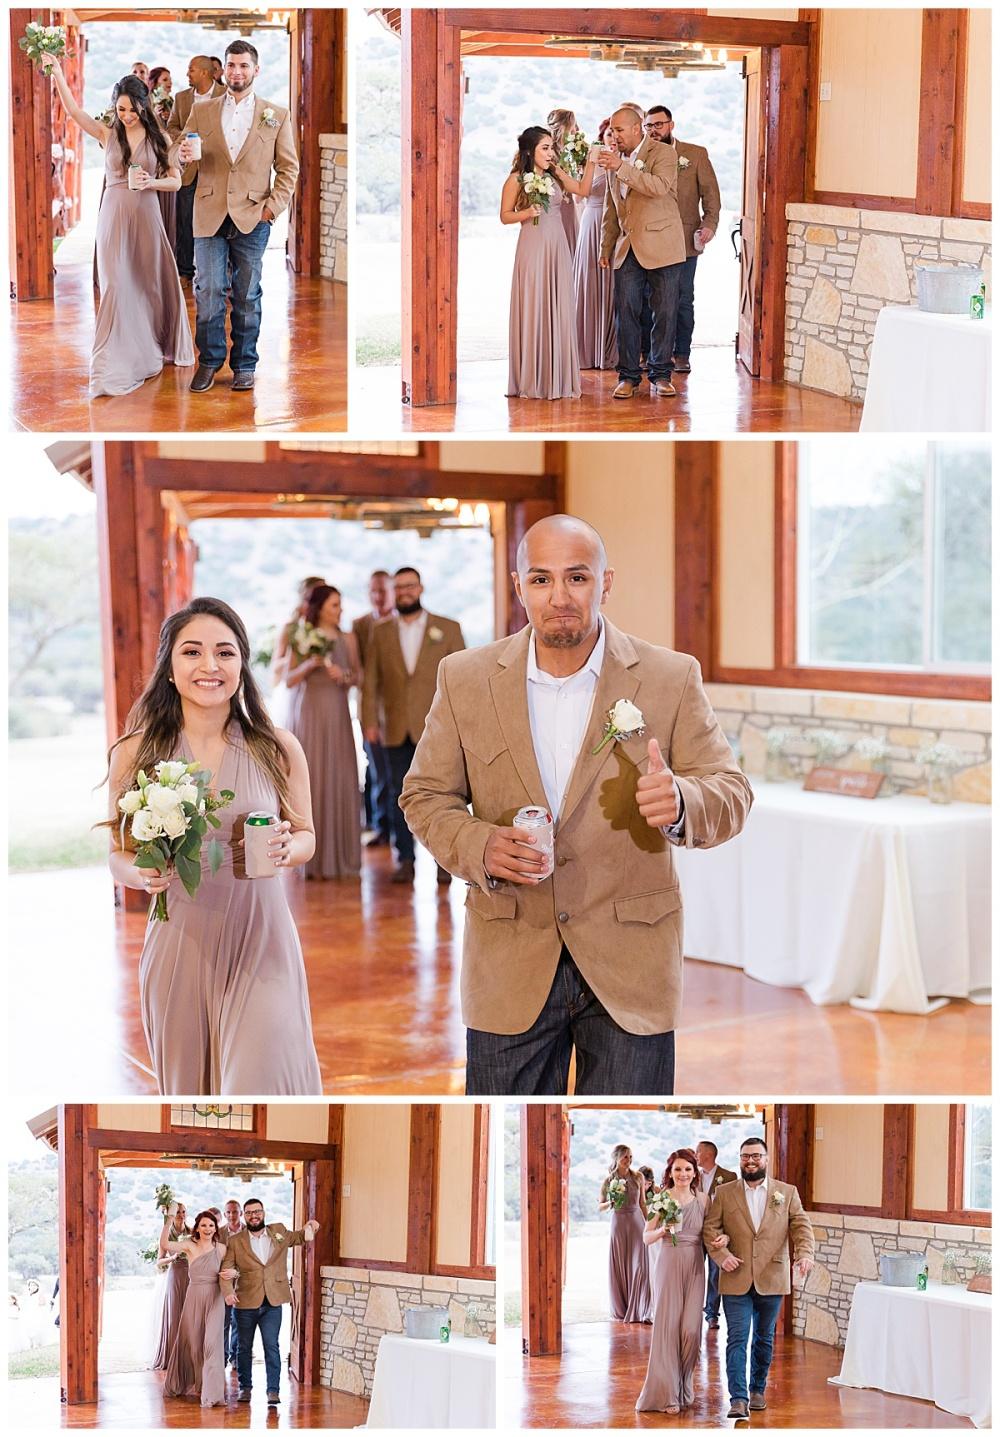 Wedding-Photographer-Texas-Hill-Country-Happy-H-Ranch-Comfor-Texas-Carly-Barton-Photography_0062.jpg